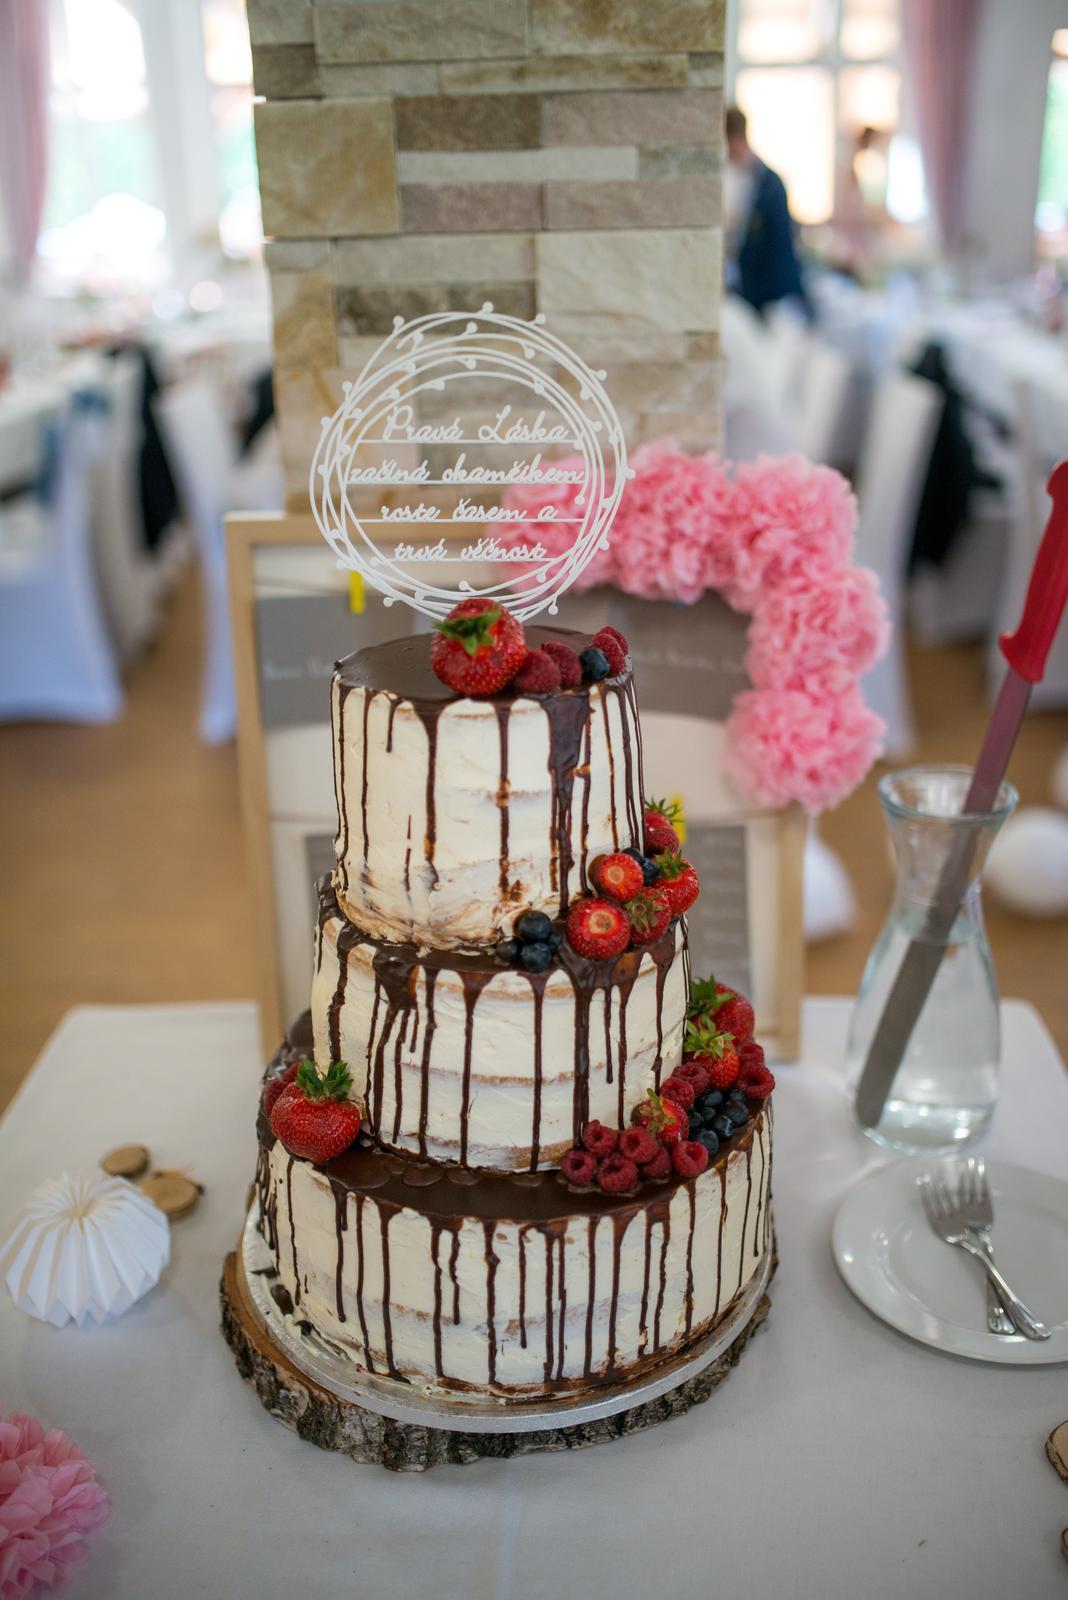 Klára{{_AND_}}Daniel - Náš vynikající dortík. Mascarpóne a jahody, maliny a borůvky.